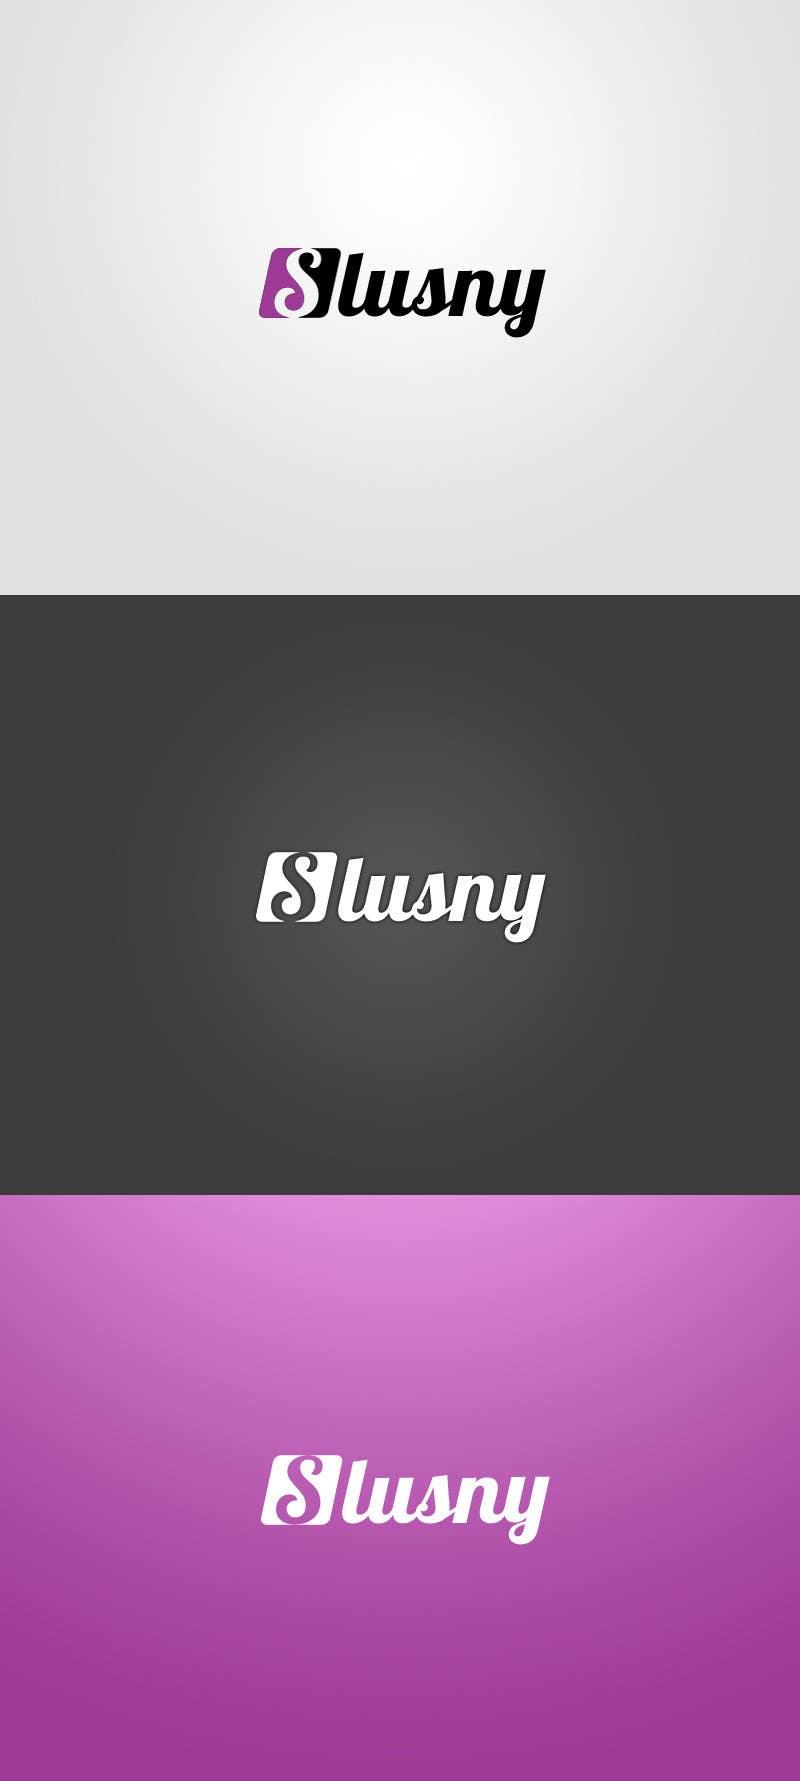 Конкурсная заявка №808 для Logo Design for Slusny - yoyo store